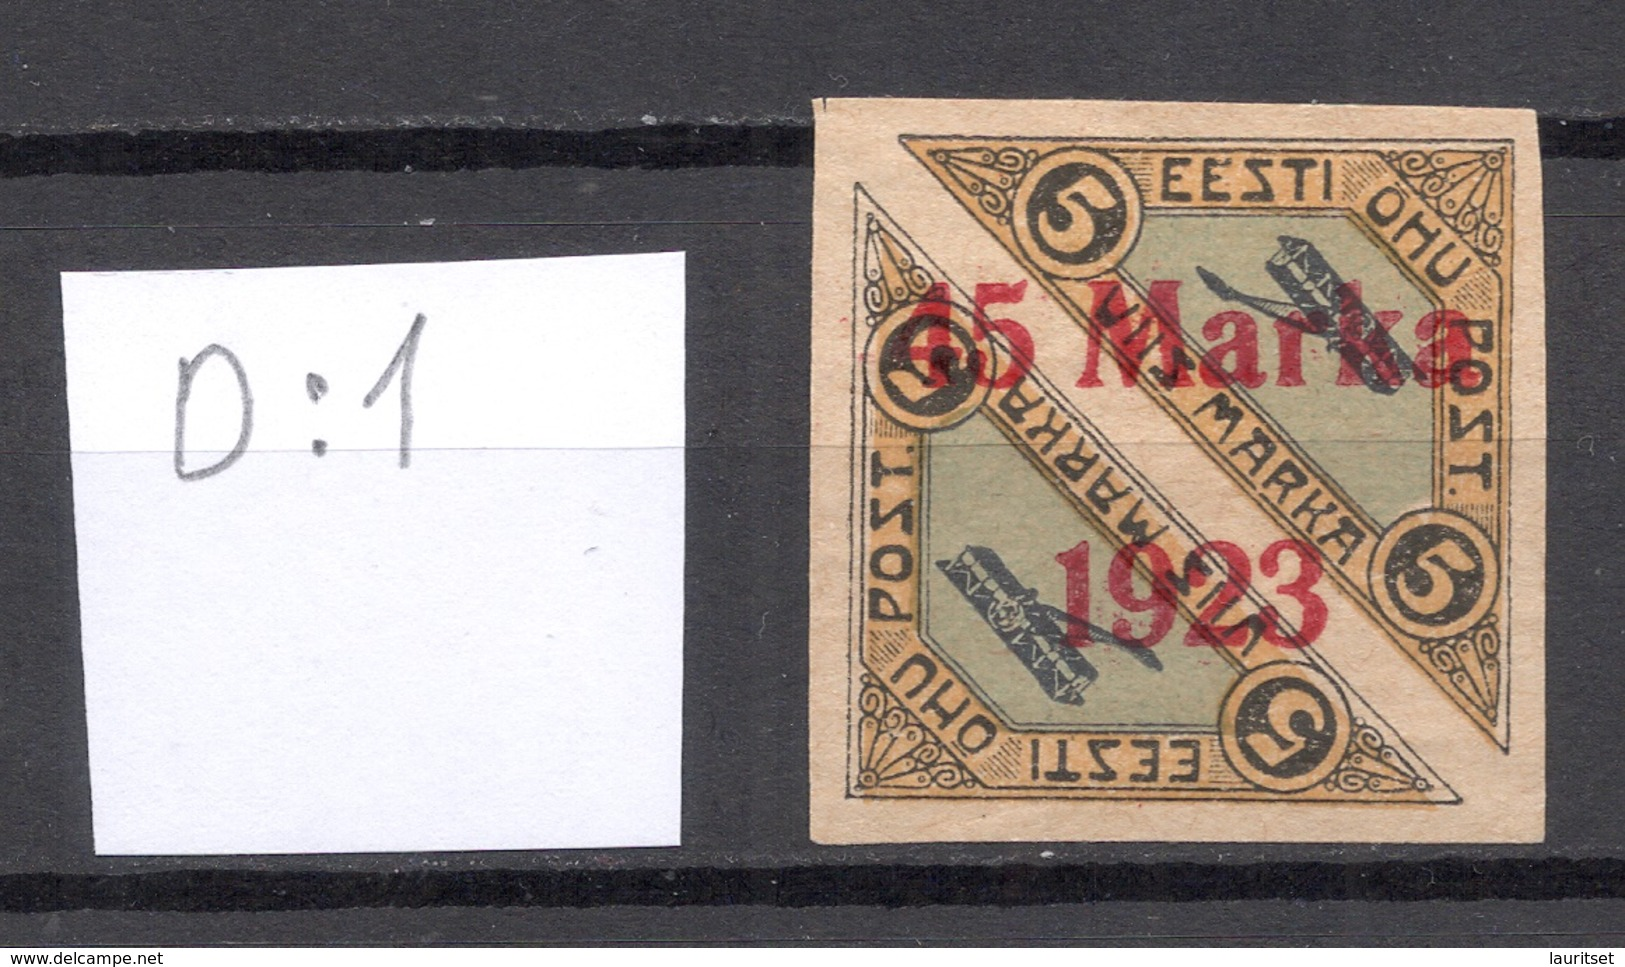 ESTLAND ESTONIA 1923 Michel 45 B II D: 1 (PATCHY Gum/Spargummi) Variety Abart * RRR - Estland